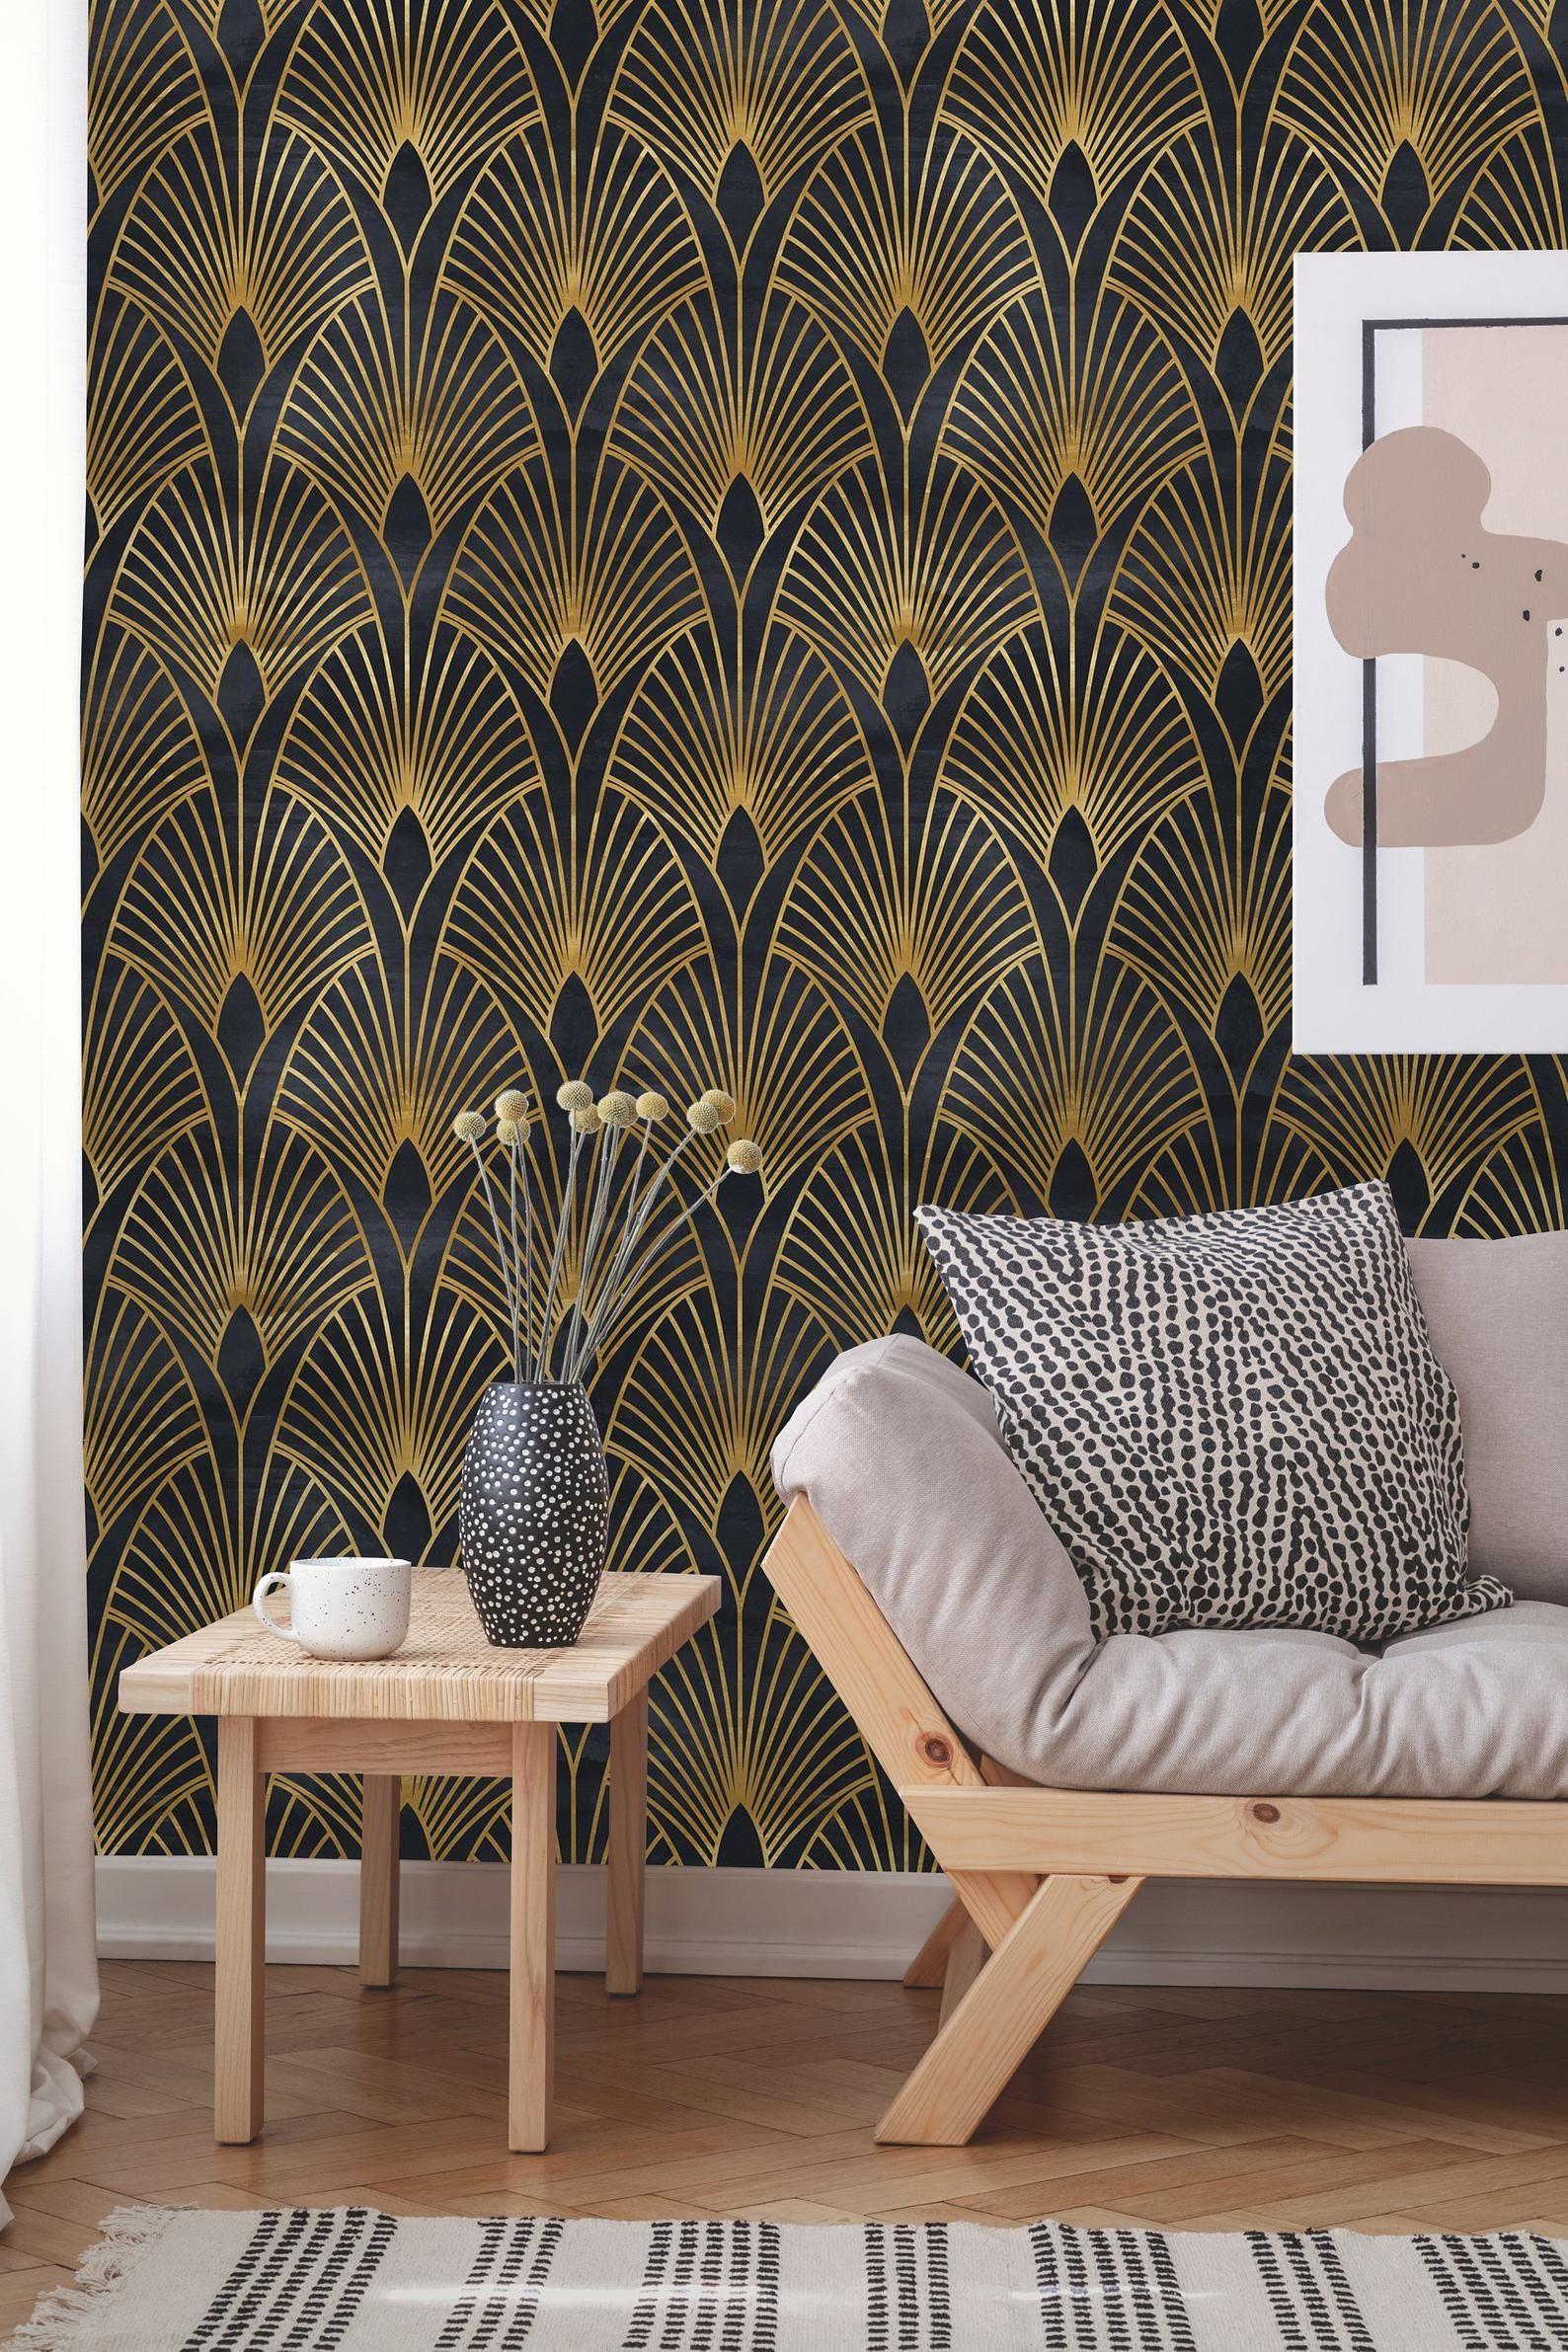 Removable Wallpaper Peel And Stick Geometric Wallpaper Self Adhesive Art Deco Wallpaper Vintage Wallpaper Art Deco Wallpaper Removable Wallpaper Geometric Wallpaper